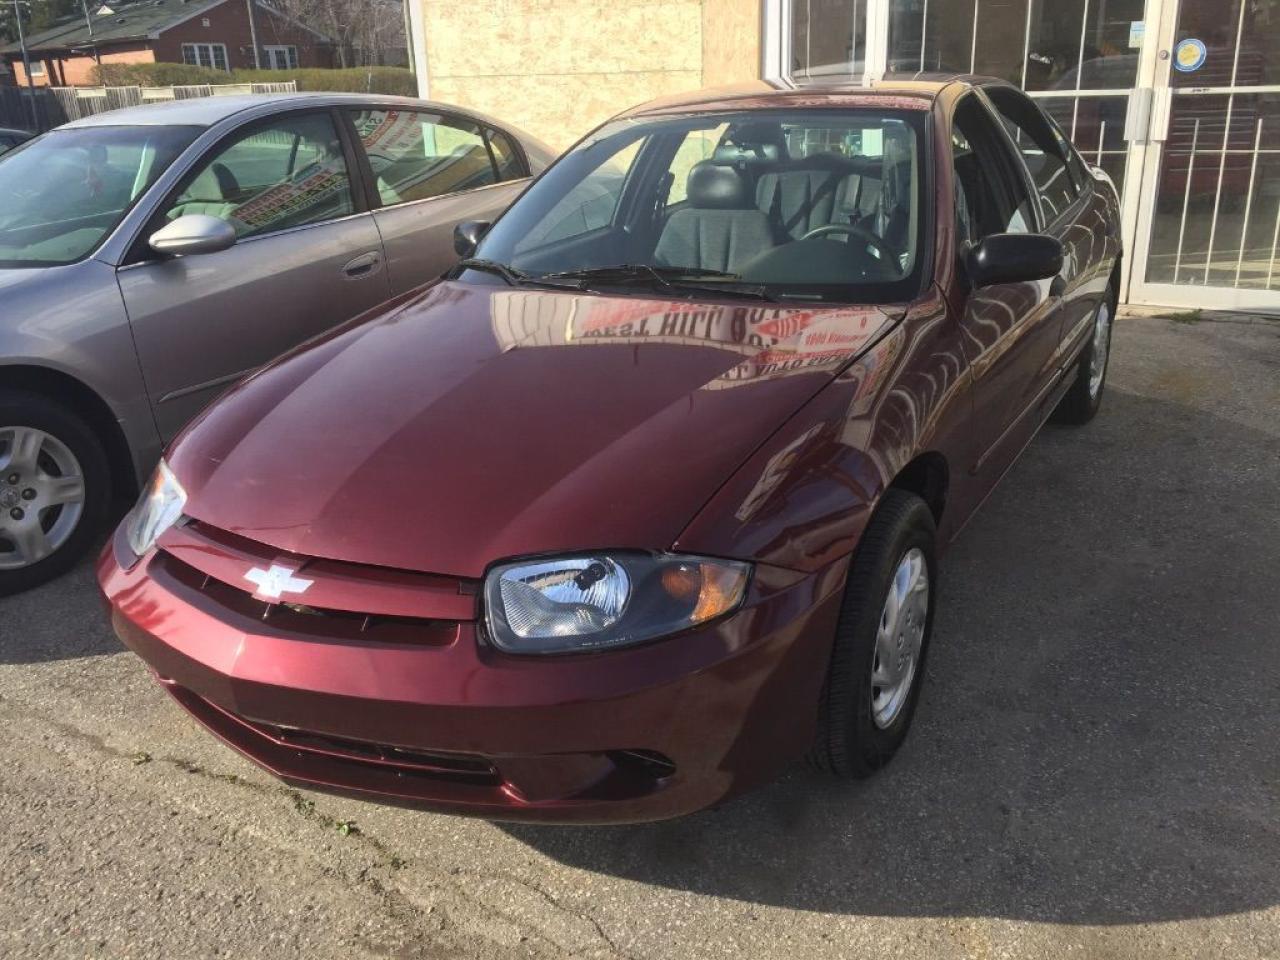 Photo of Burgundy 2003 Chevrolet Cavalier